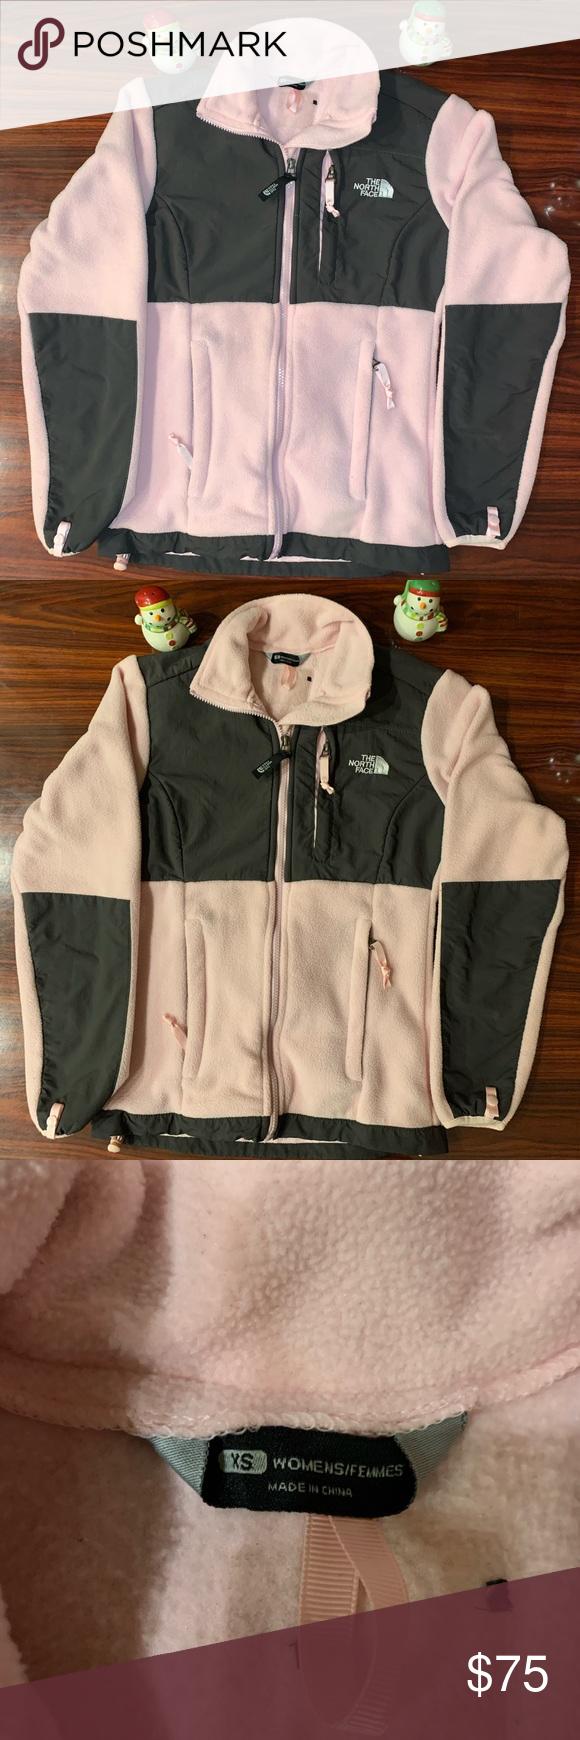 The North Face Denali Jacket Fashion Clothes Design Fashion Design [ 1740 x 580 Pixel ]